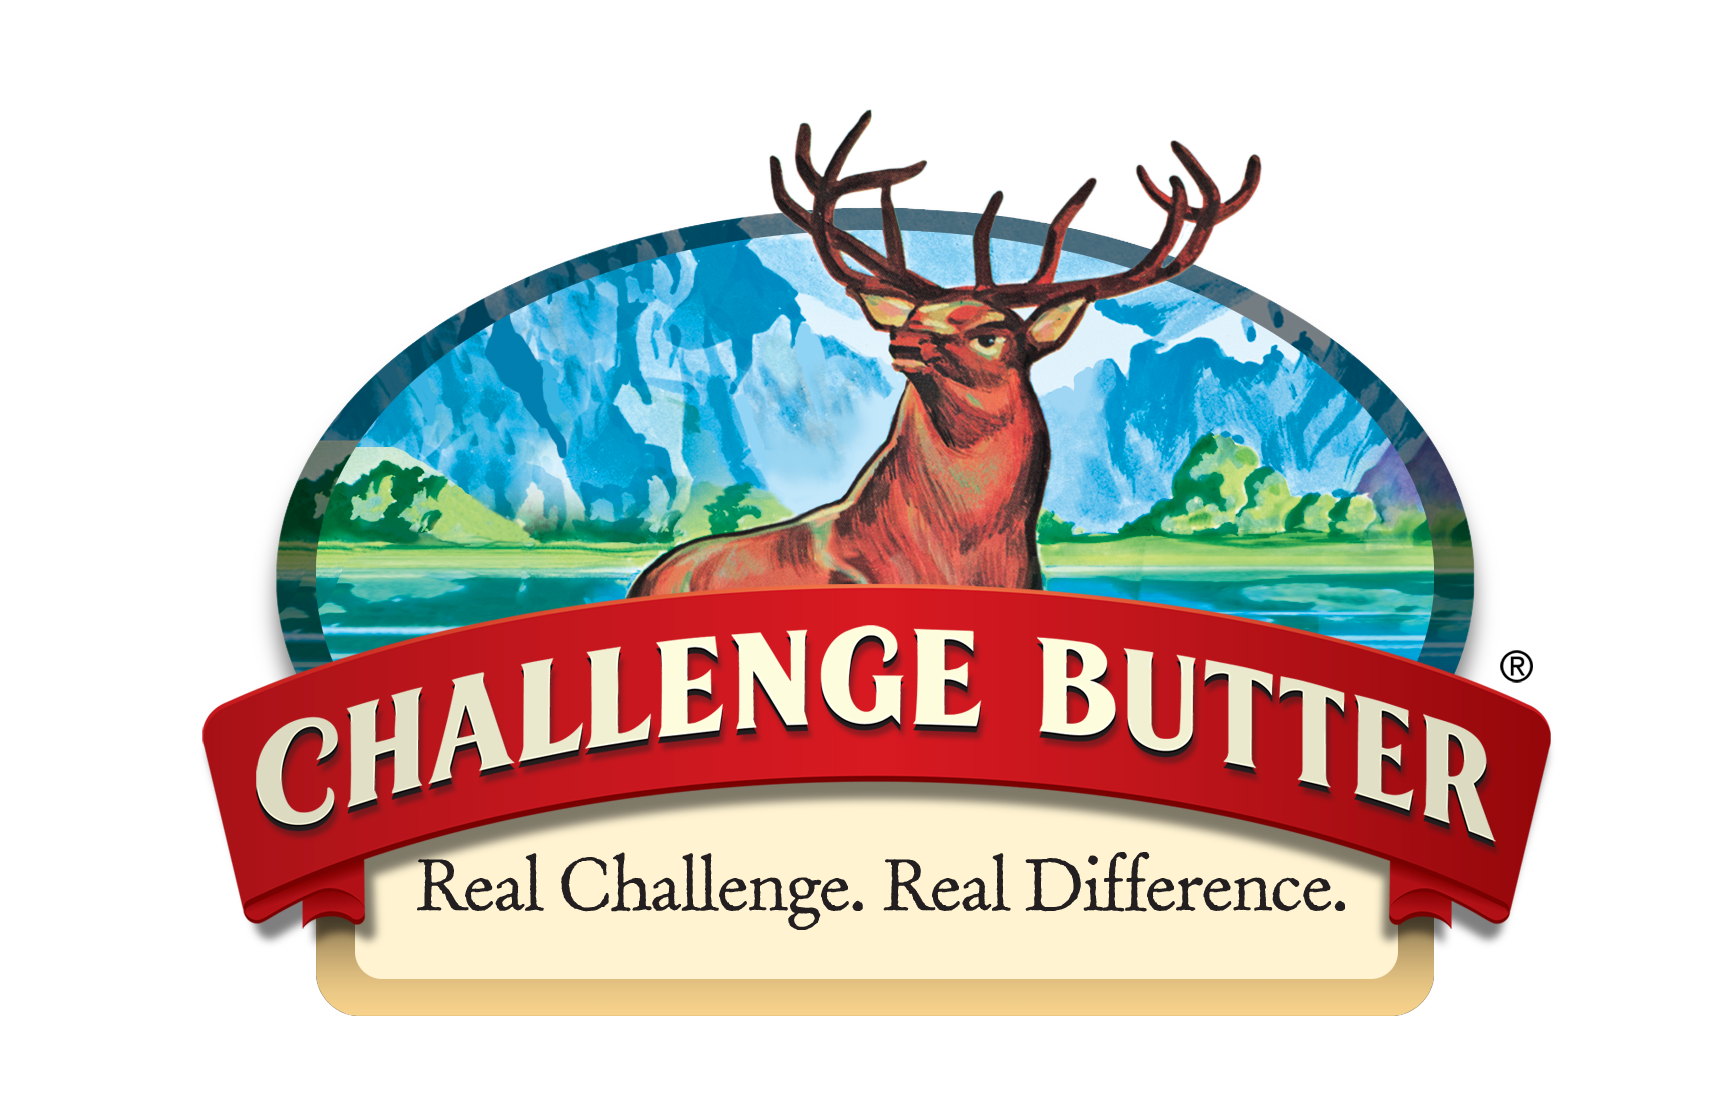 Challenge Butter logo